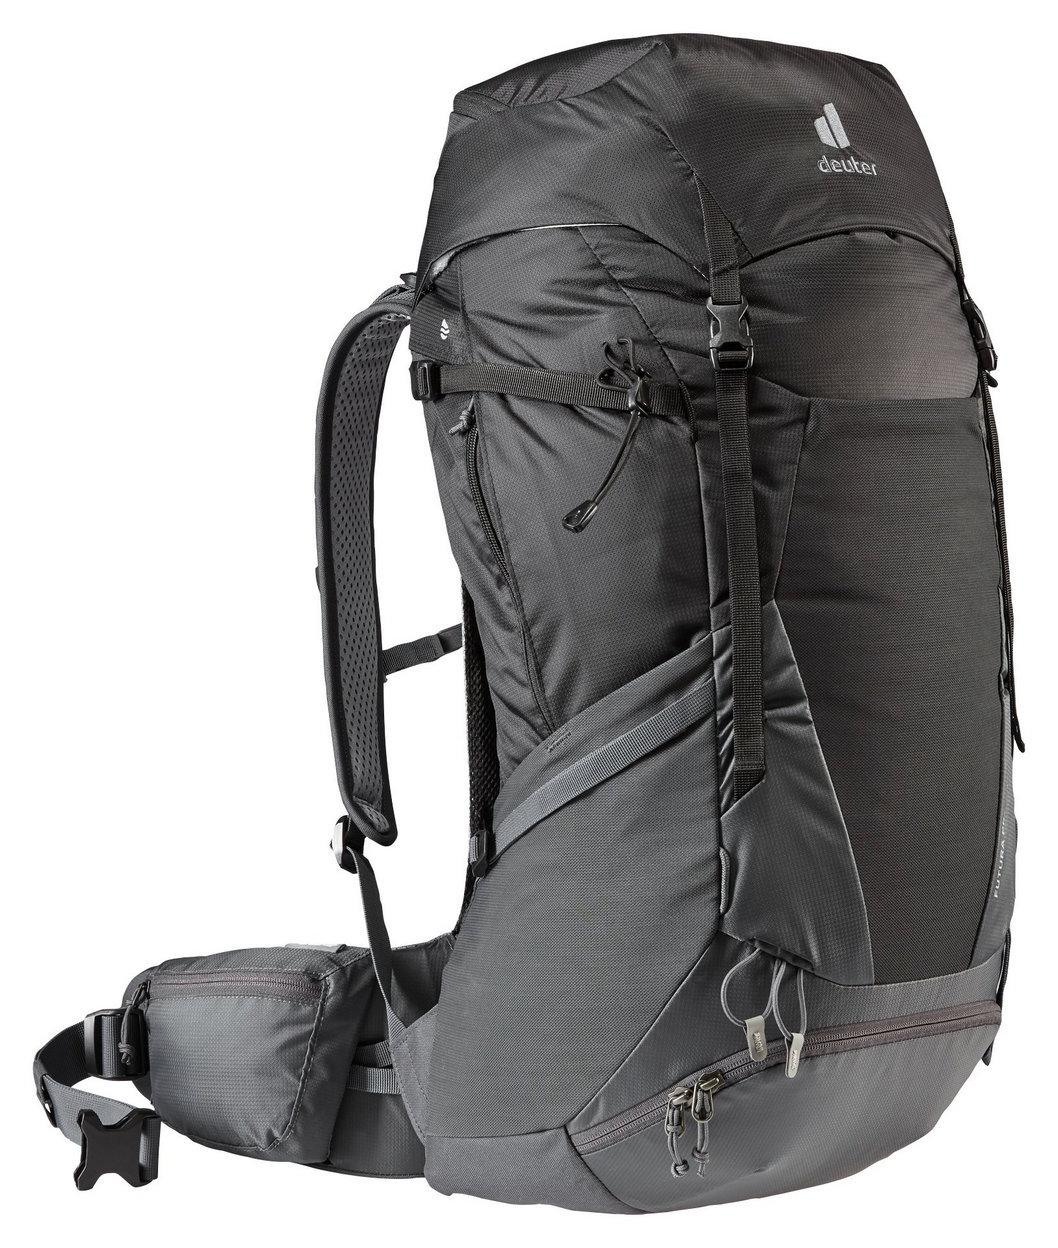 Туристические рюкзаки легкие Рюкзак Deuter Futura Pro 40 (2021) 3401321-7403-Futura_Pro_40-d00.jpg